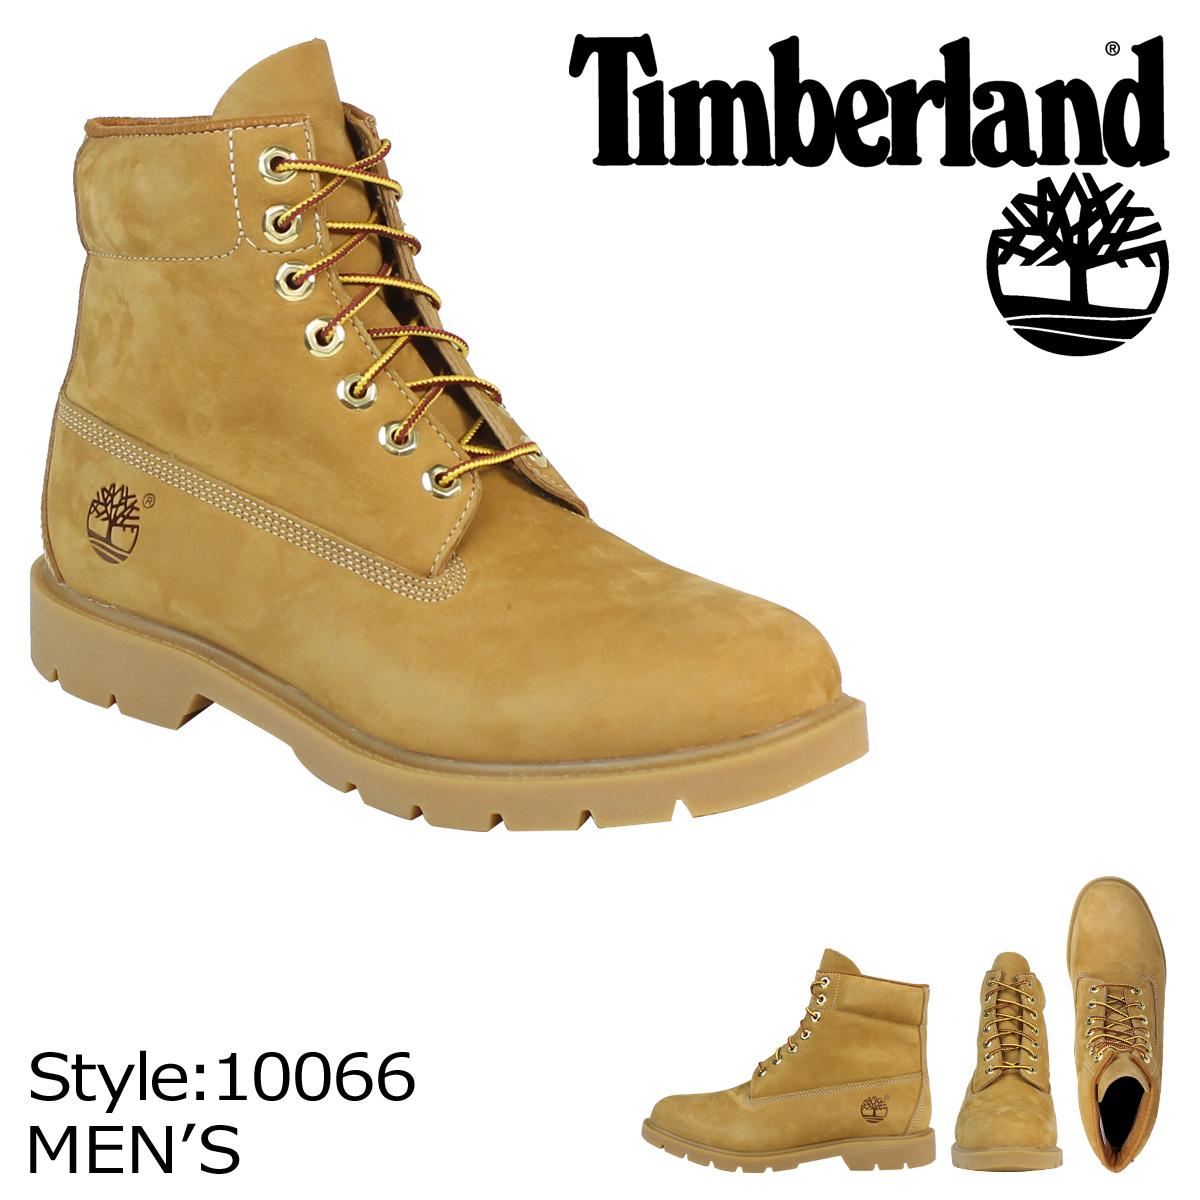 bb08a7f58eab Sugar Online Shop  Timberland Timberland 6 inch basic waterproof boots 6  inch Basic Waterproof Boot nubuck mens 10066 wheat  11   14 Add in stock    regular  ...